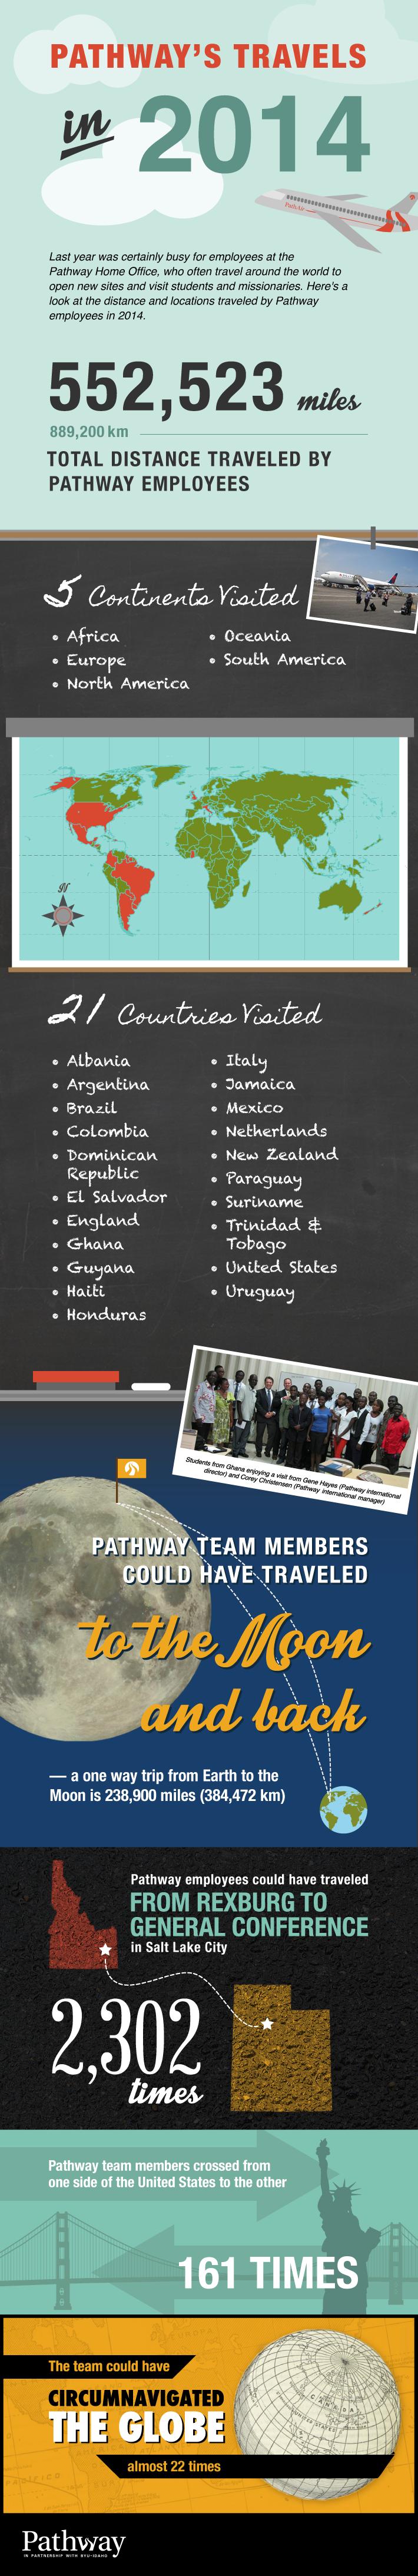 NEWS-Travel-Infographic